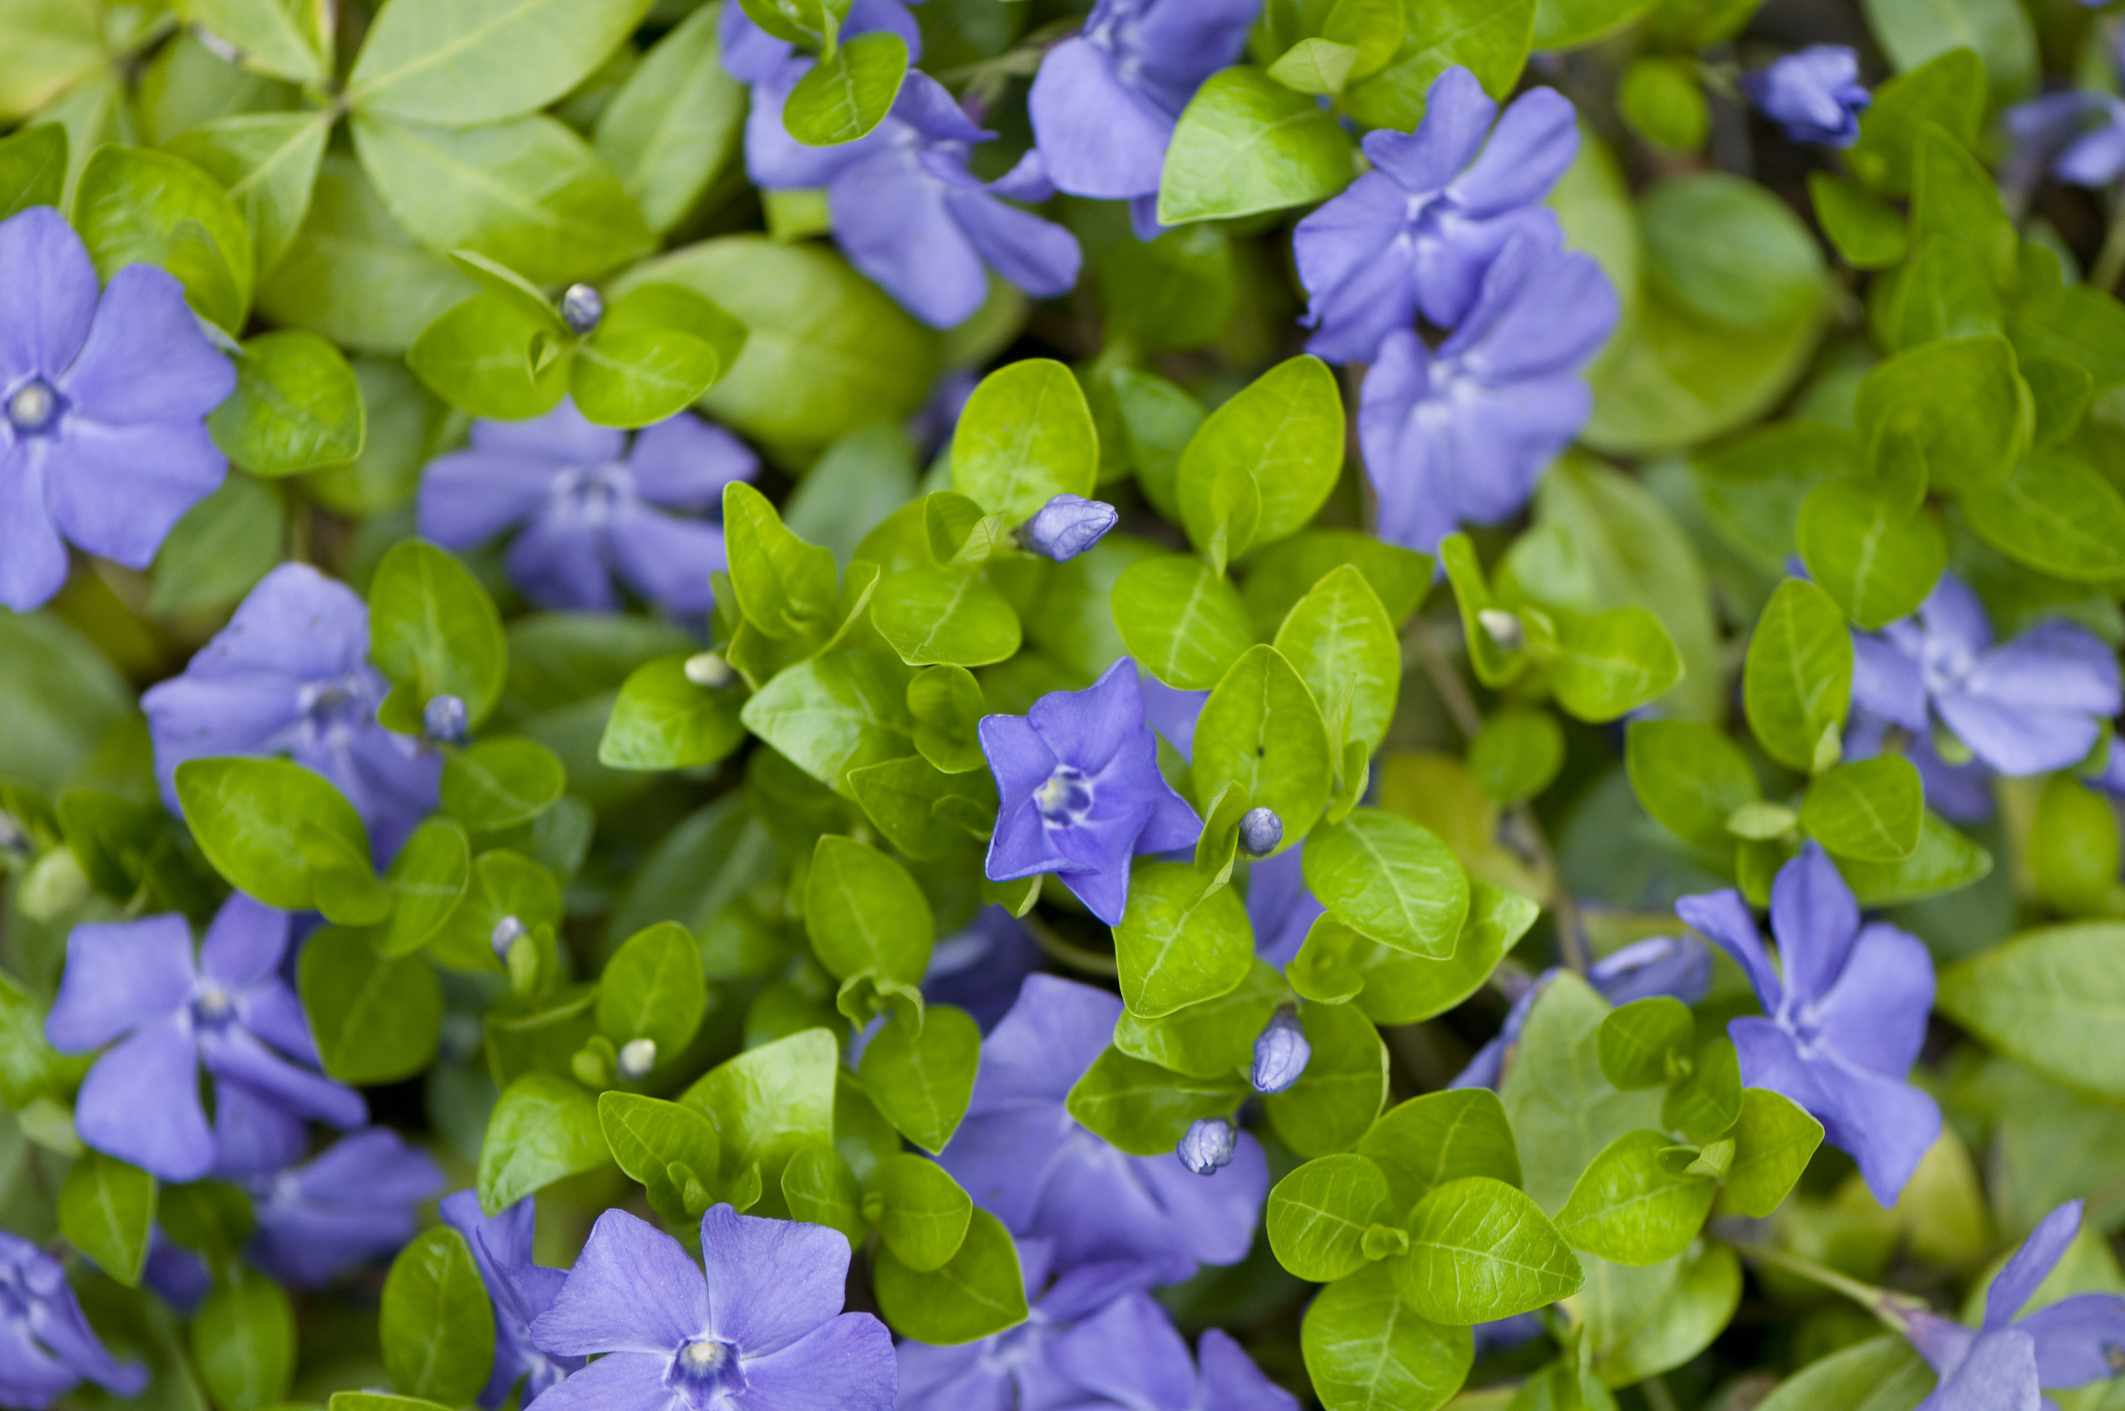 Vinca minor vines with blue flowers.